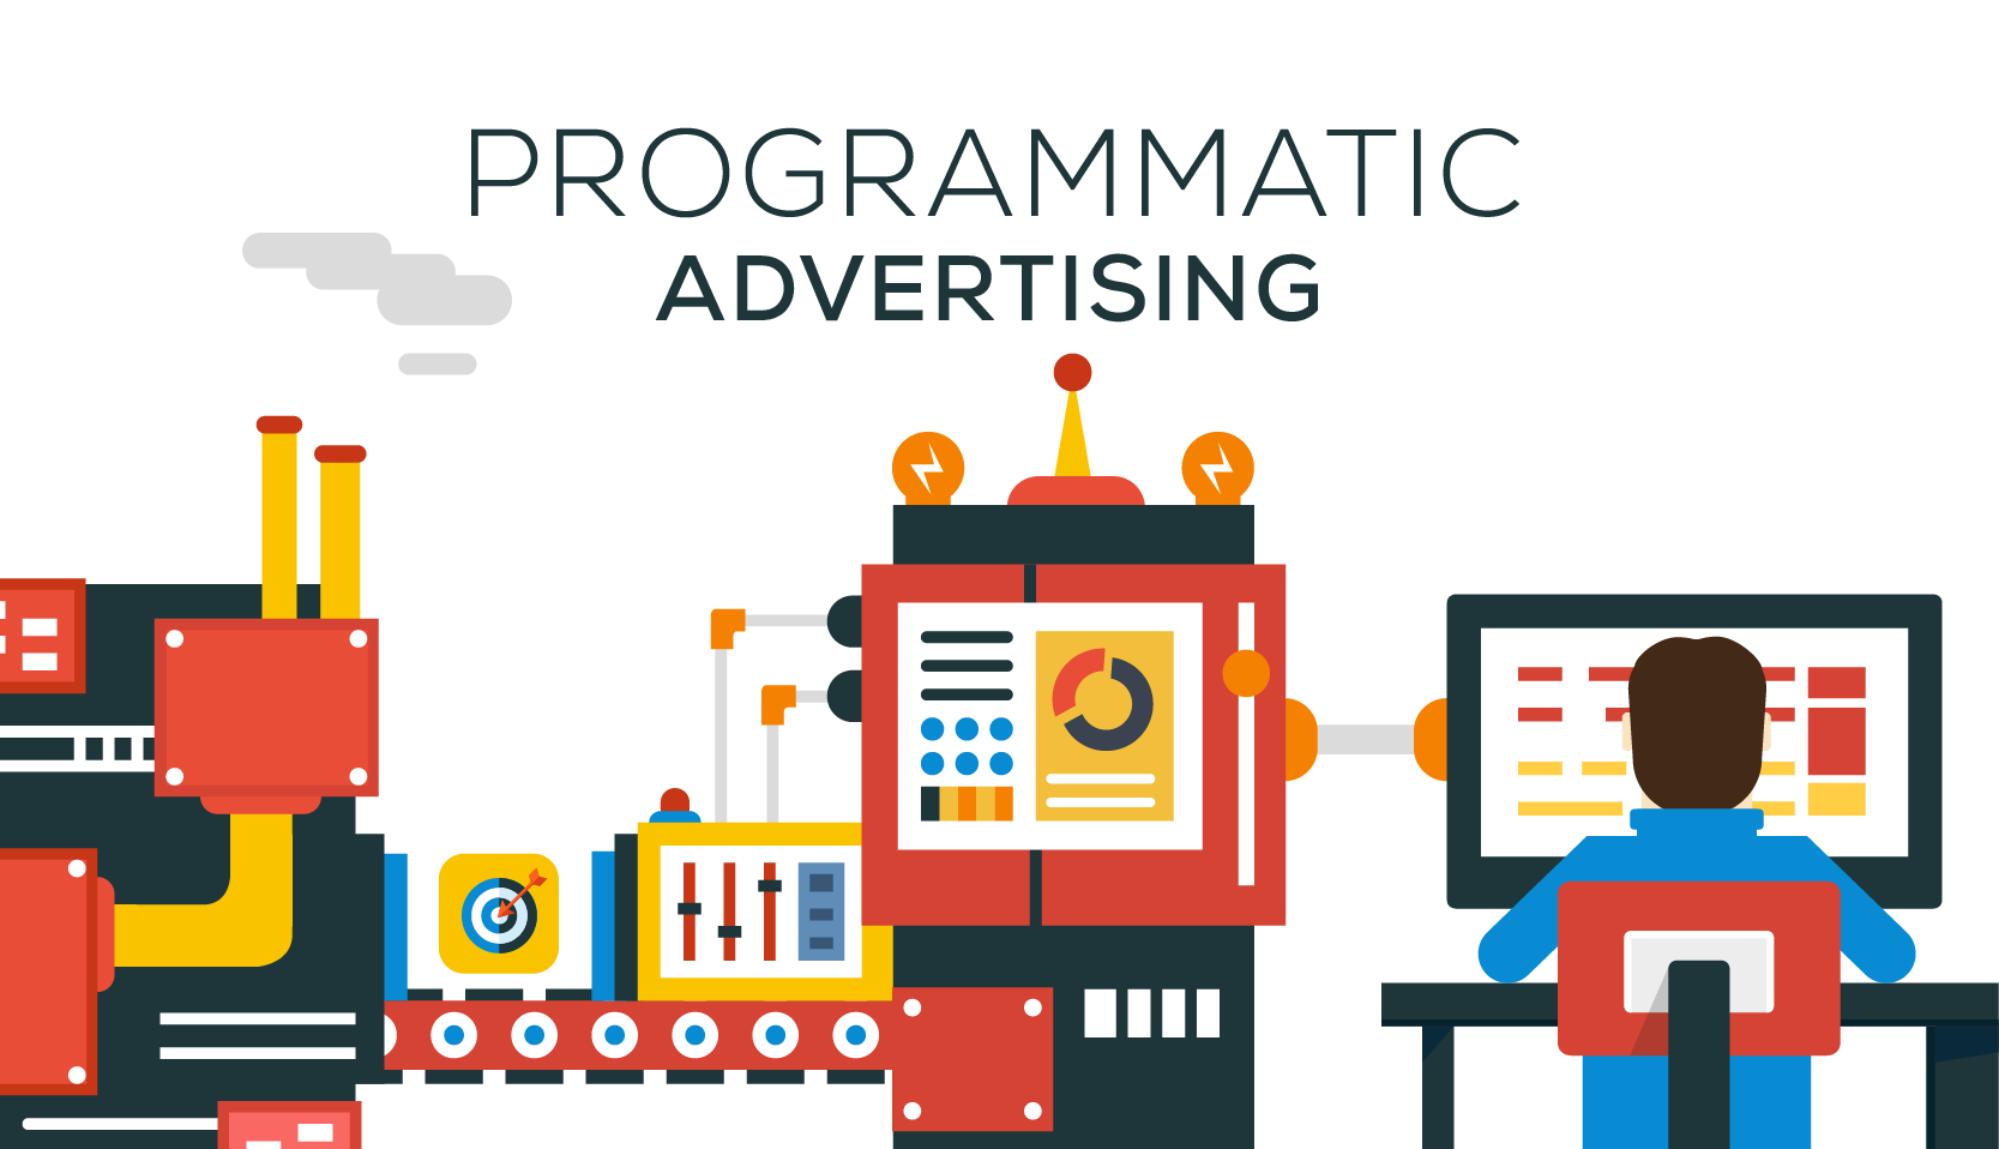 advantages programmatic advertising